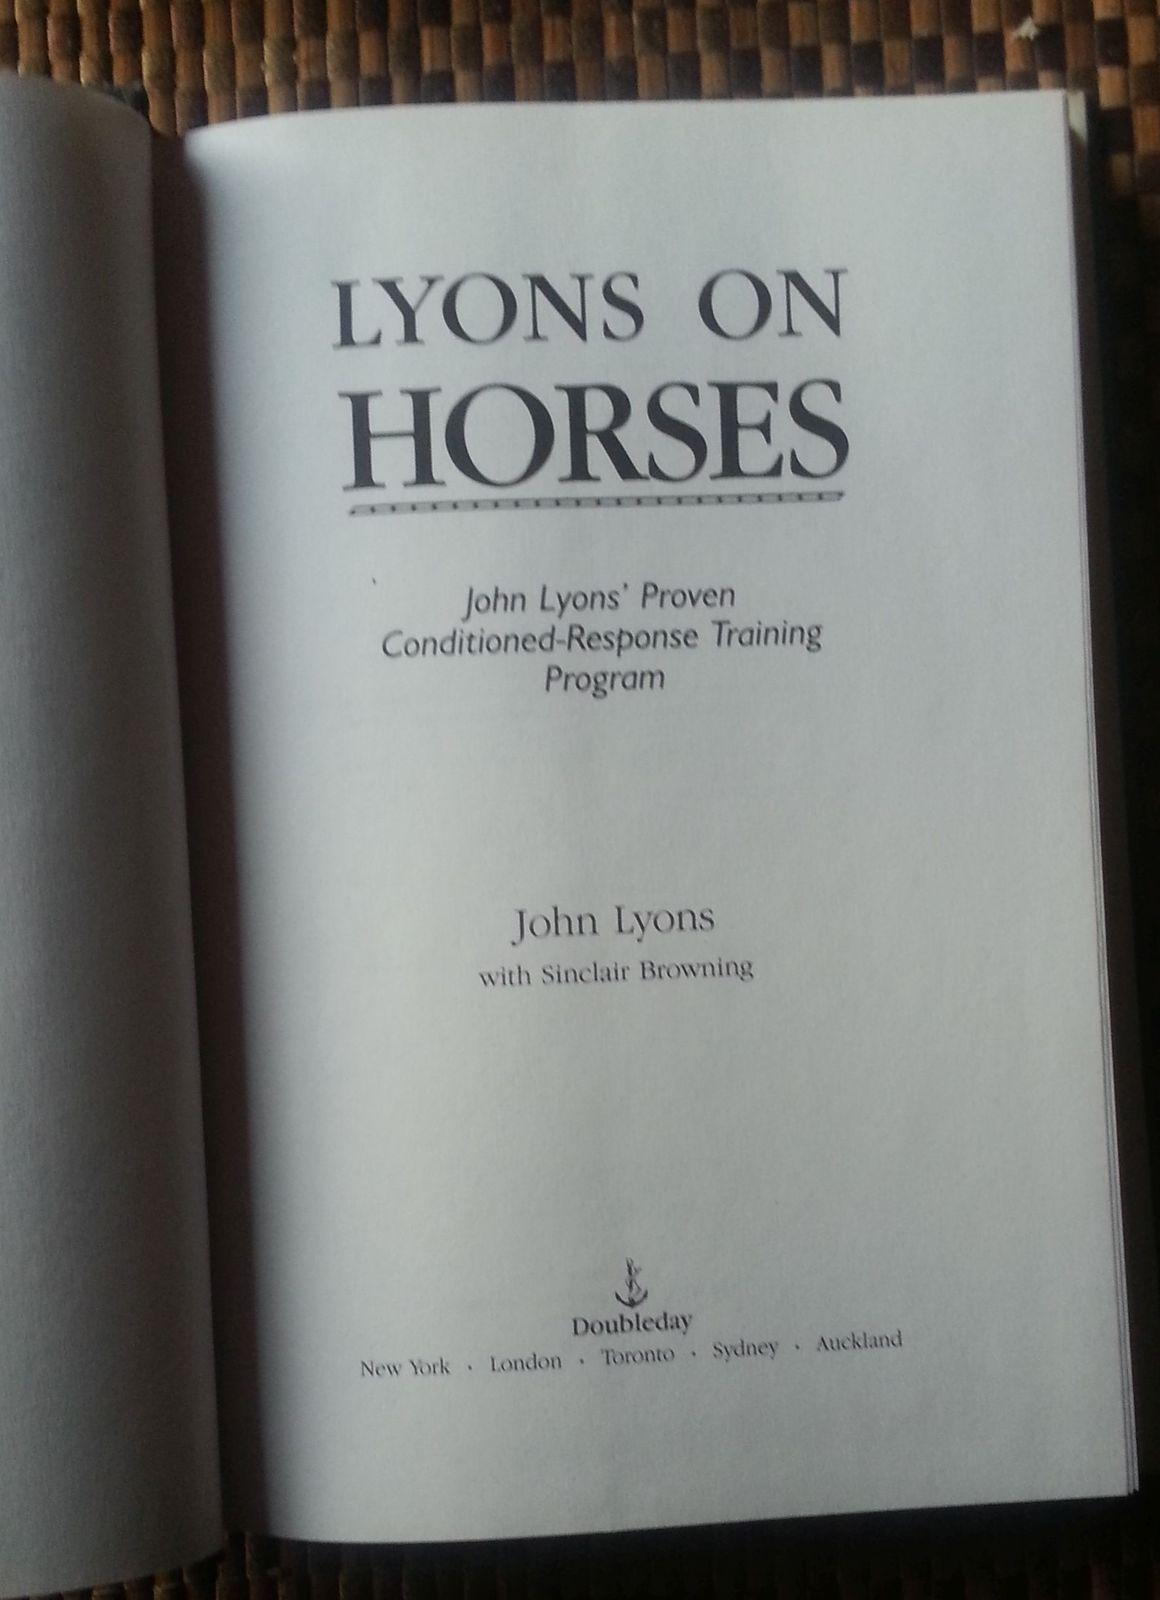 Lyons On Horses Training Program by John Lyons 1991 HBDJ